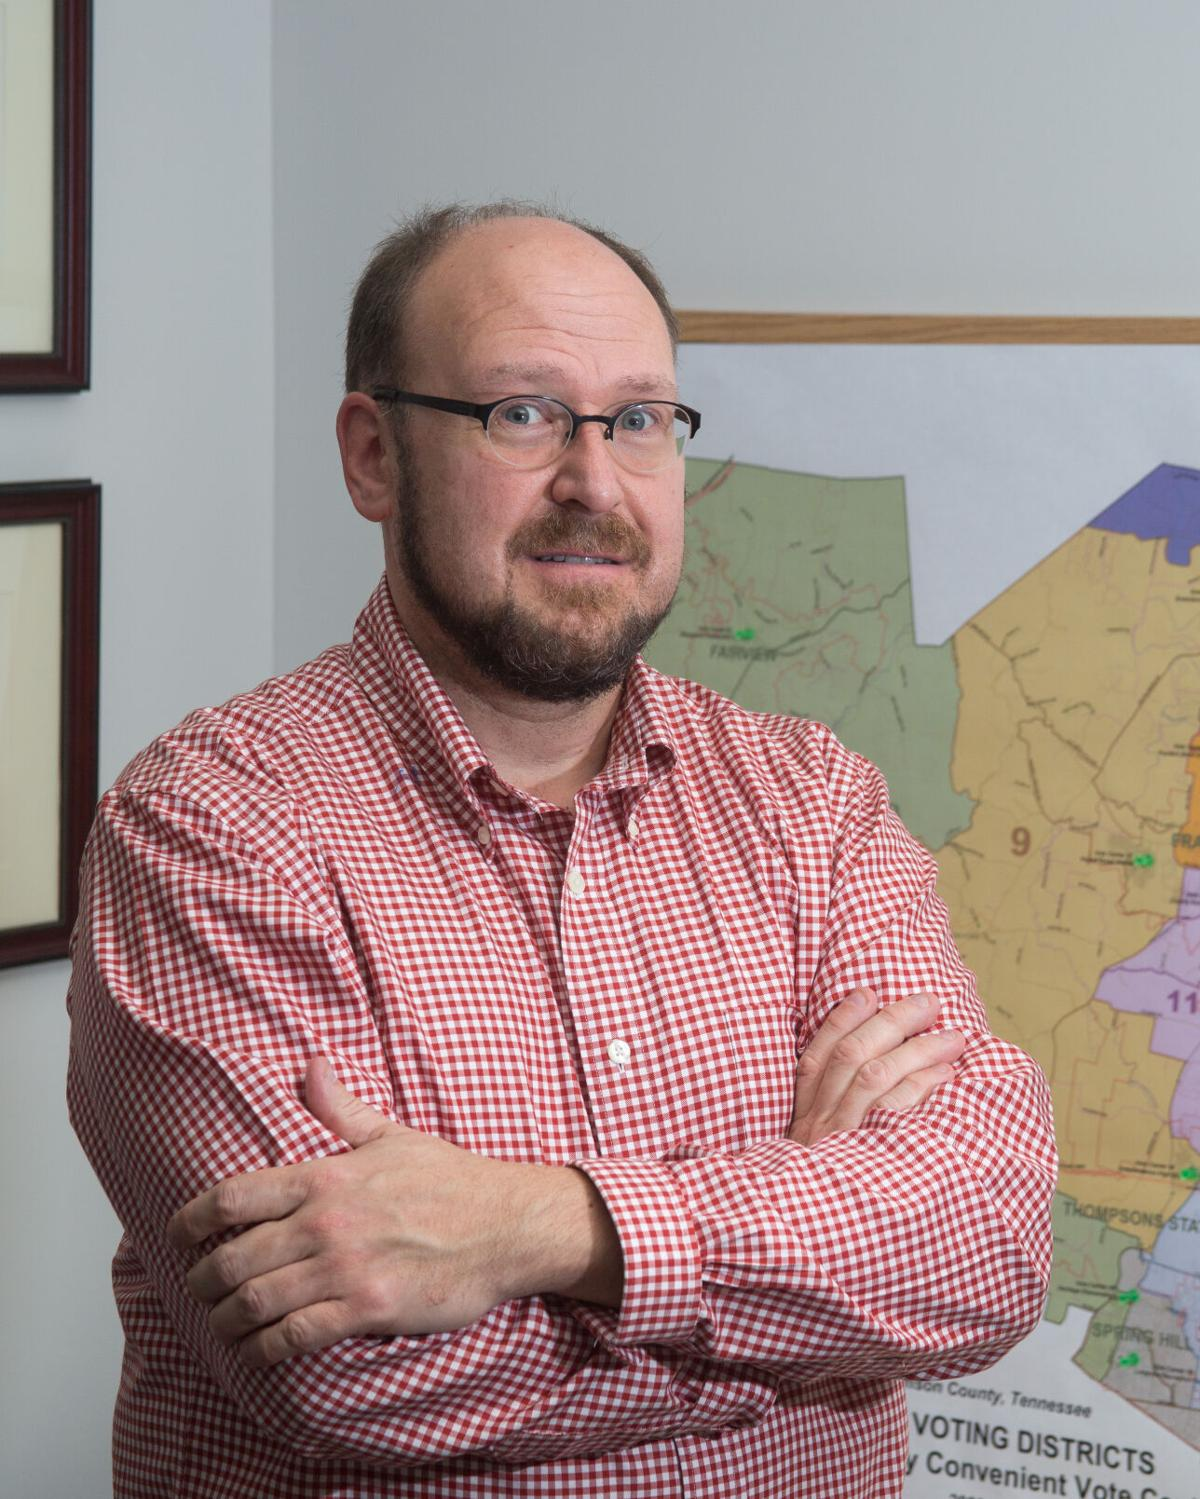 Williamson County Election Administrator Chad Gray